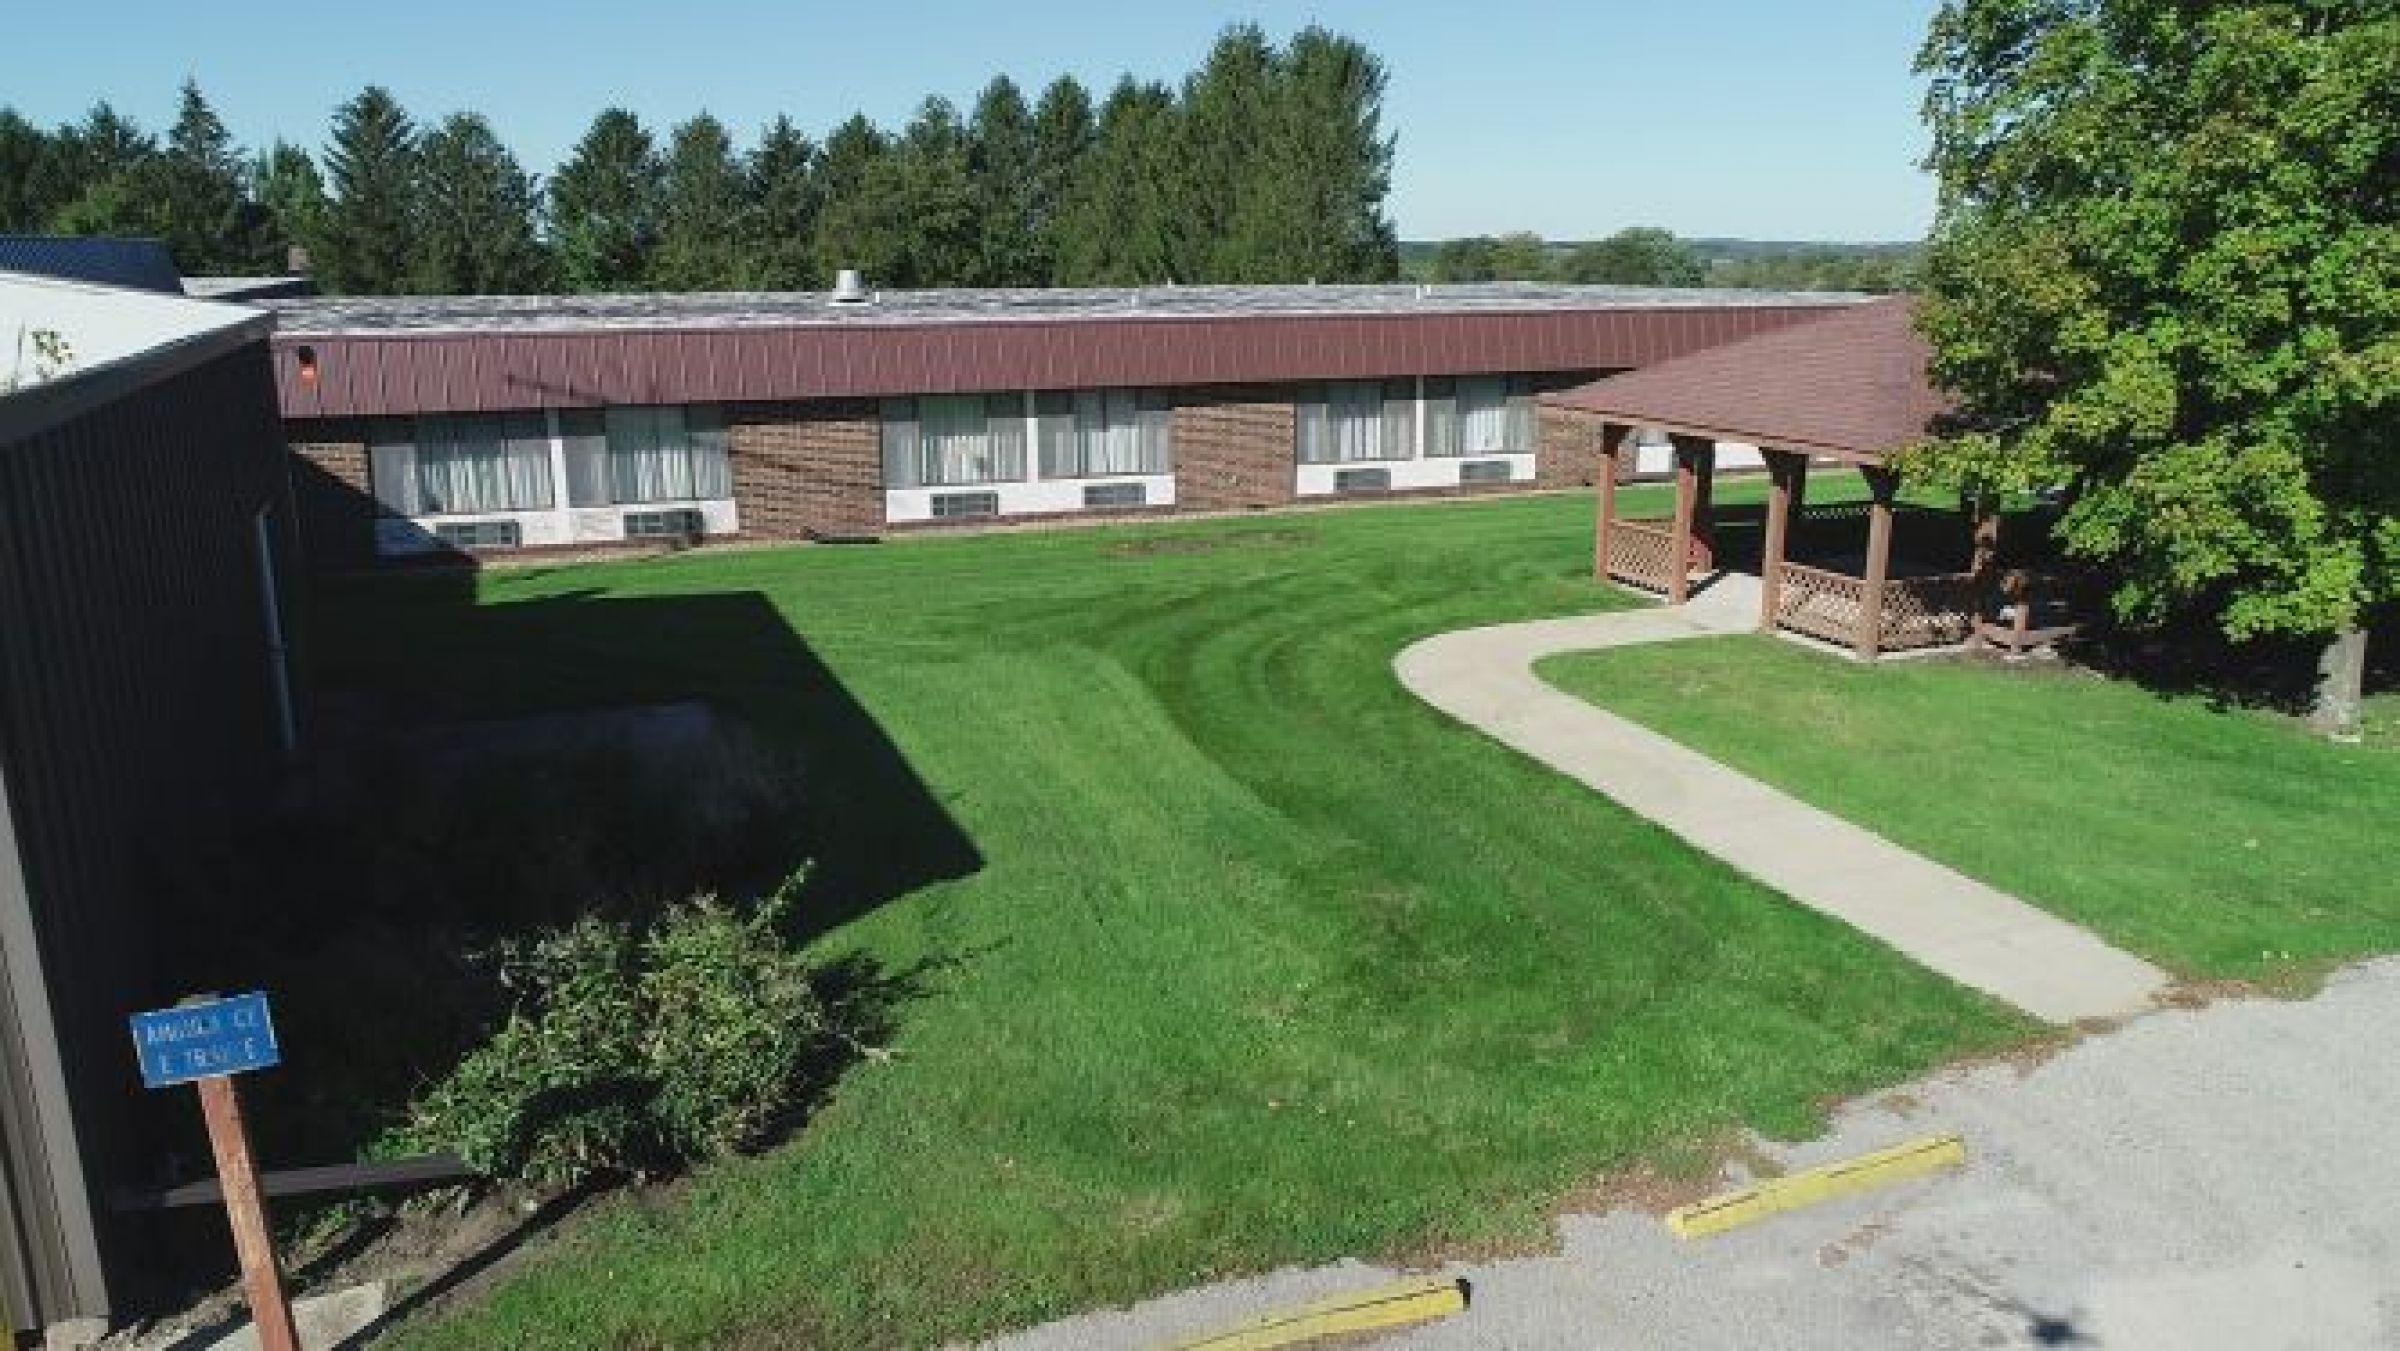 14742-afton-care-center-afton-iowa-0-2019-10-23-173241.jpg